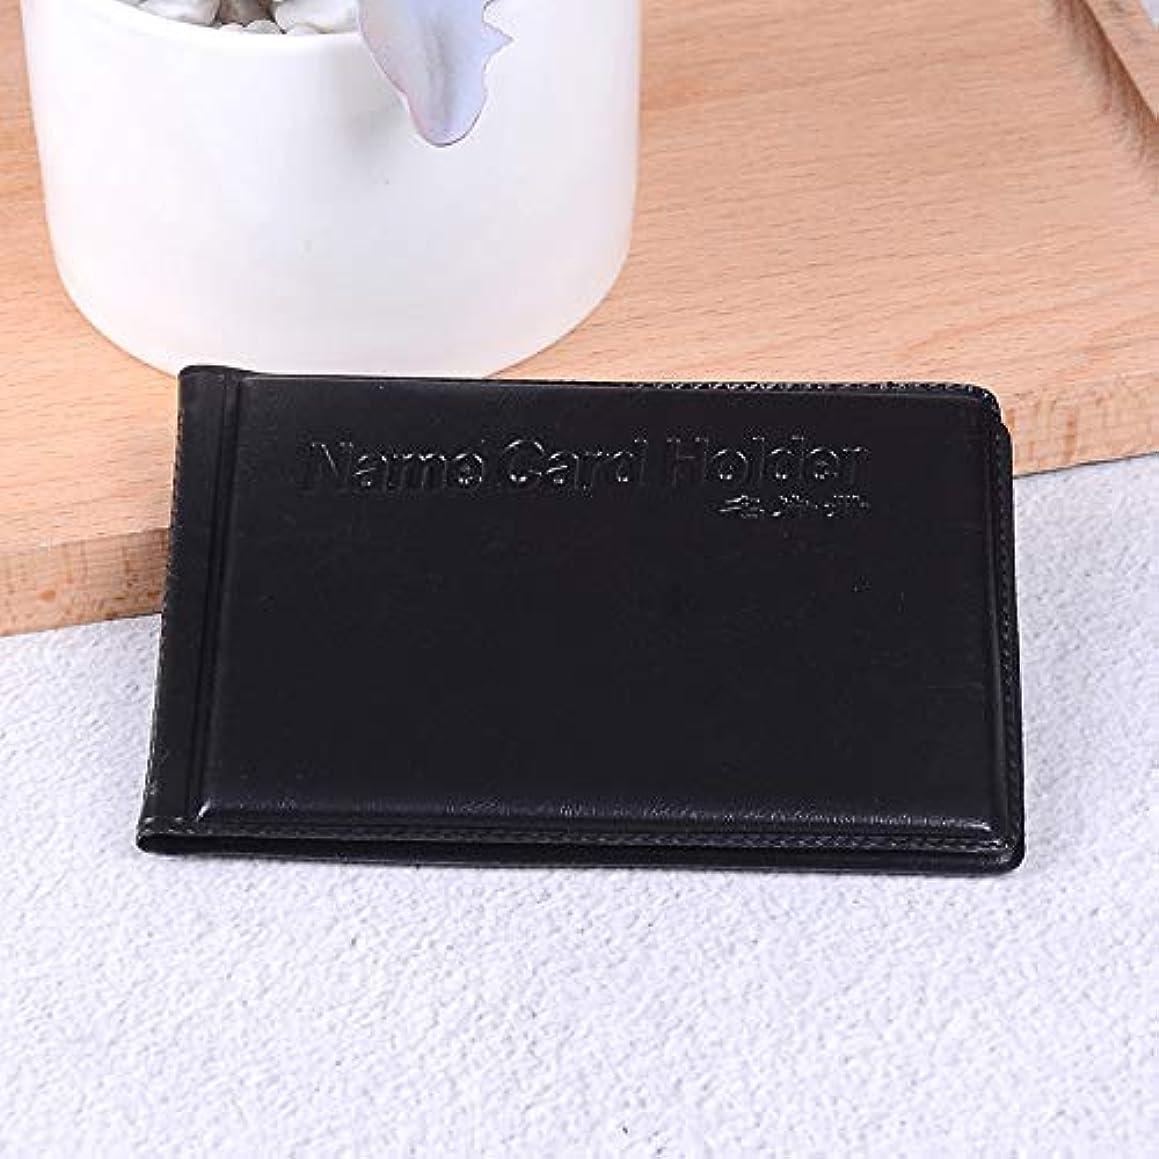 Storage Boxes & Bins - Pu Leather 40 Cards Id Credit Card Holder Book Case Keeper Organizer Passport Business Vintage Bag - Boxes Bins Storage Storage Boxes Bins Leather Jacket Rfid Protec